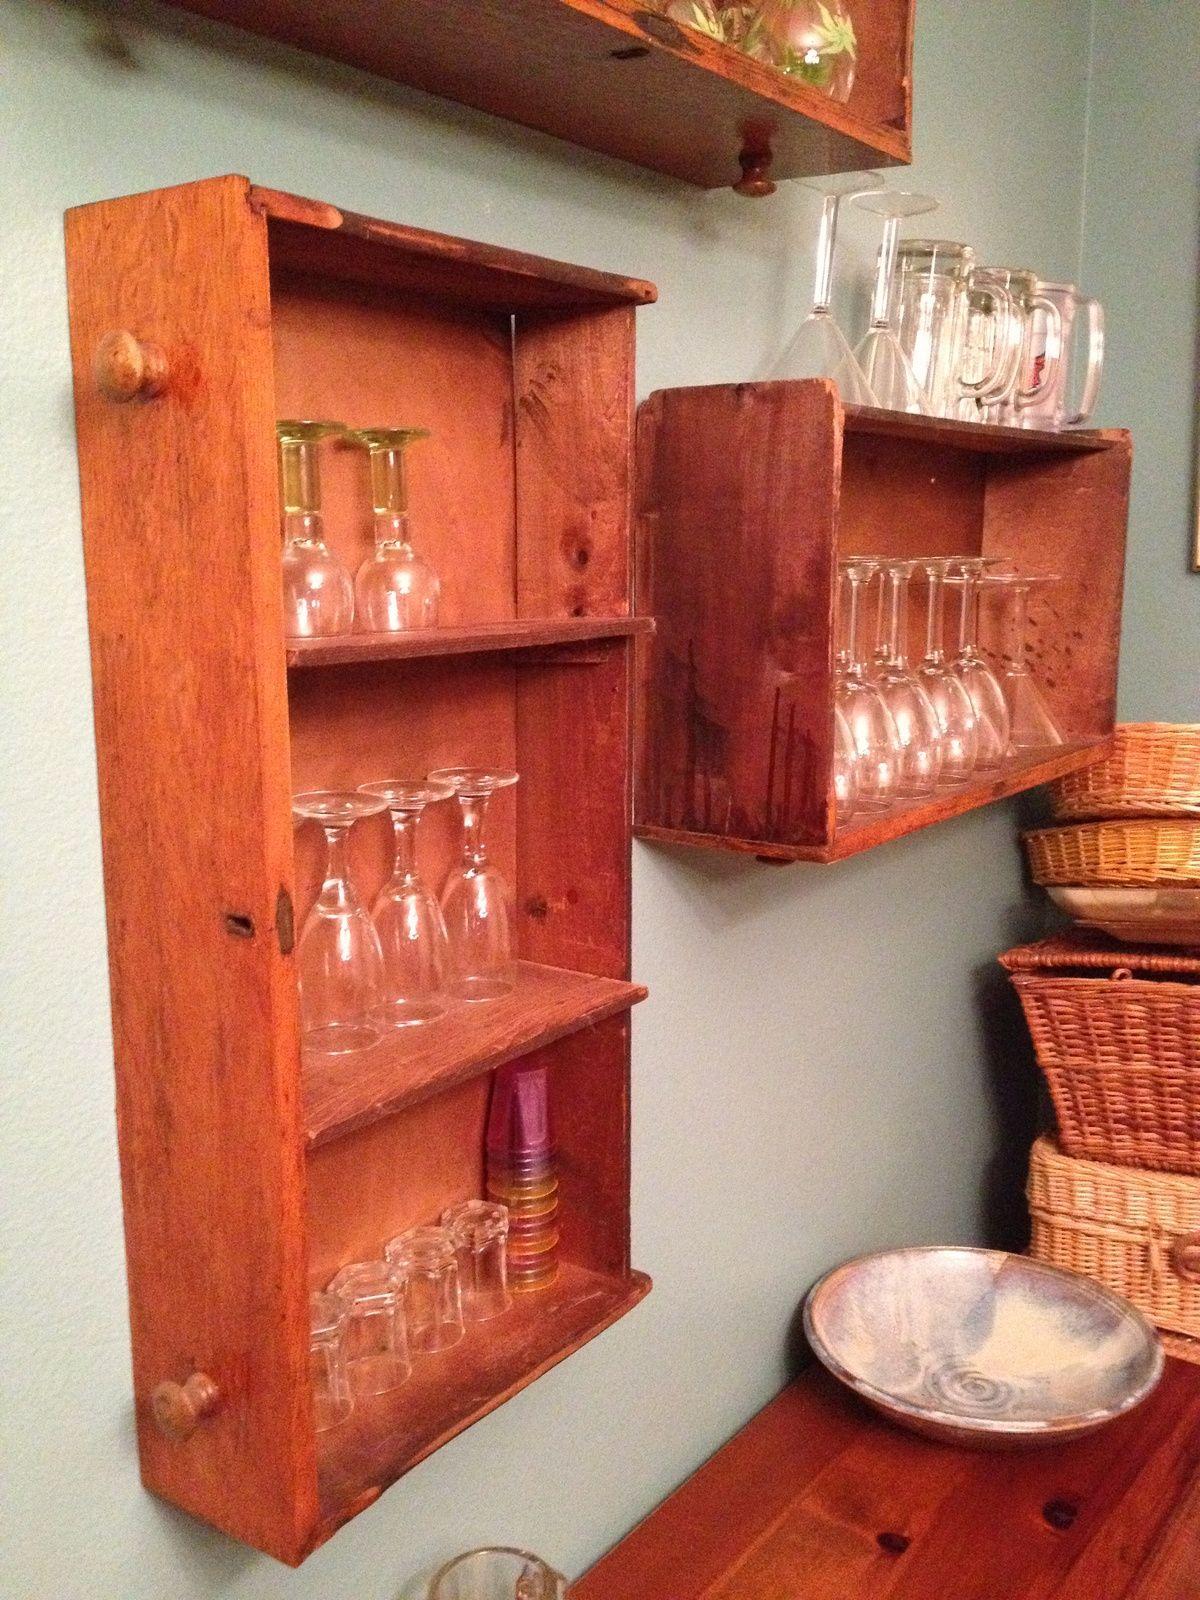 Pin By Jennifer Sexton On Diy To Repurposed Drawers Repurposed Drawers Repurposed Diy Repurposed Dresser